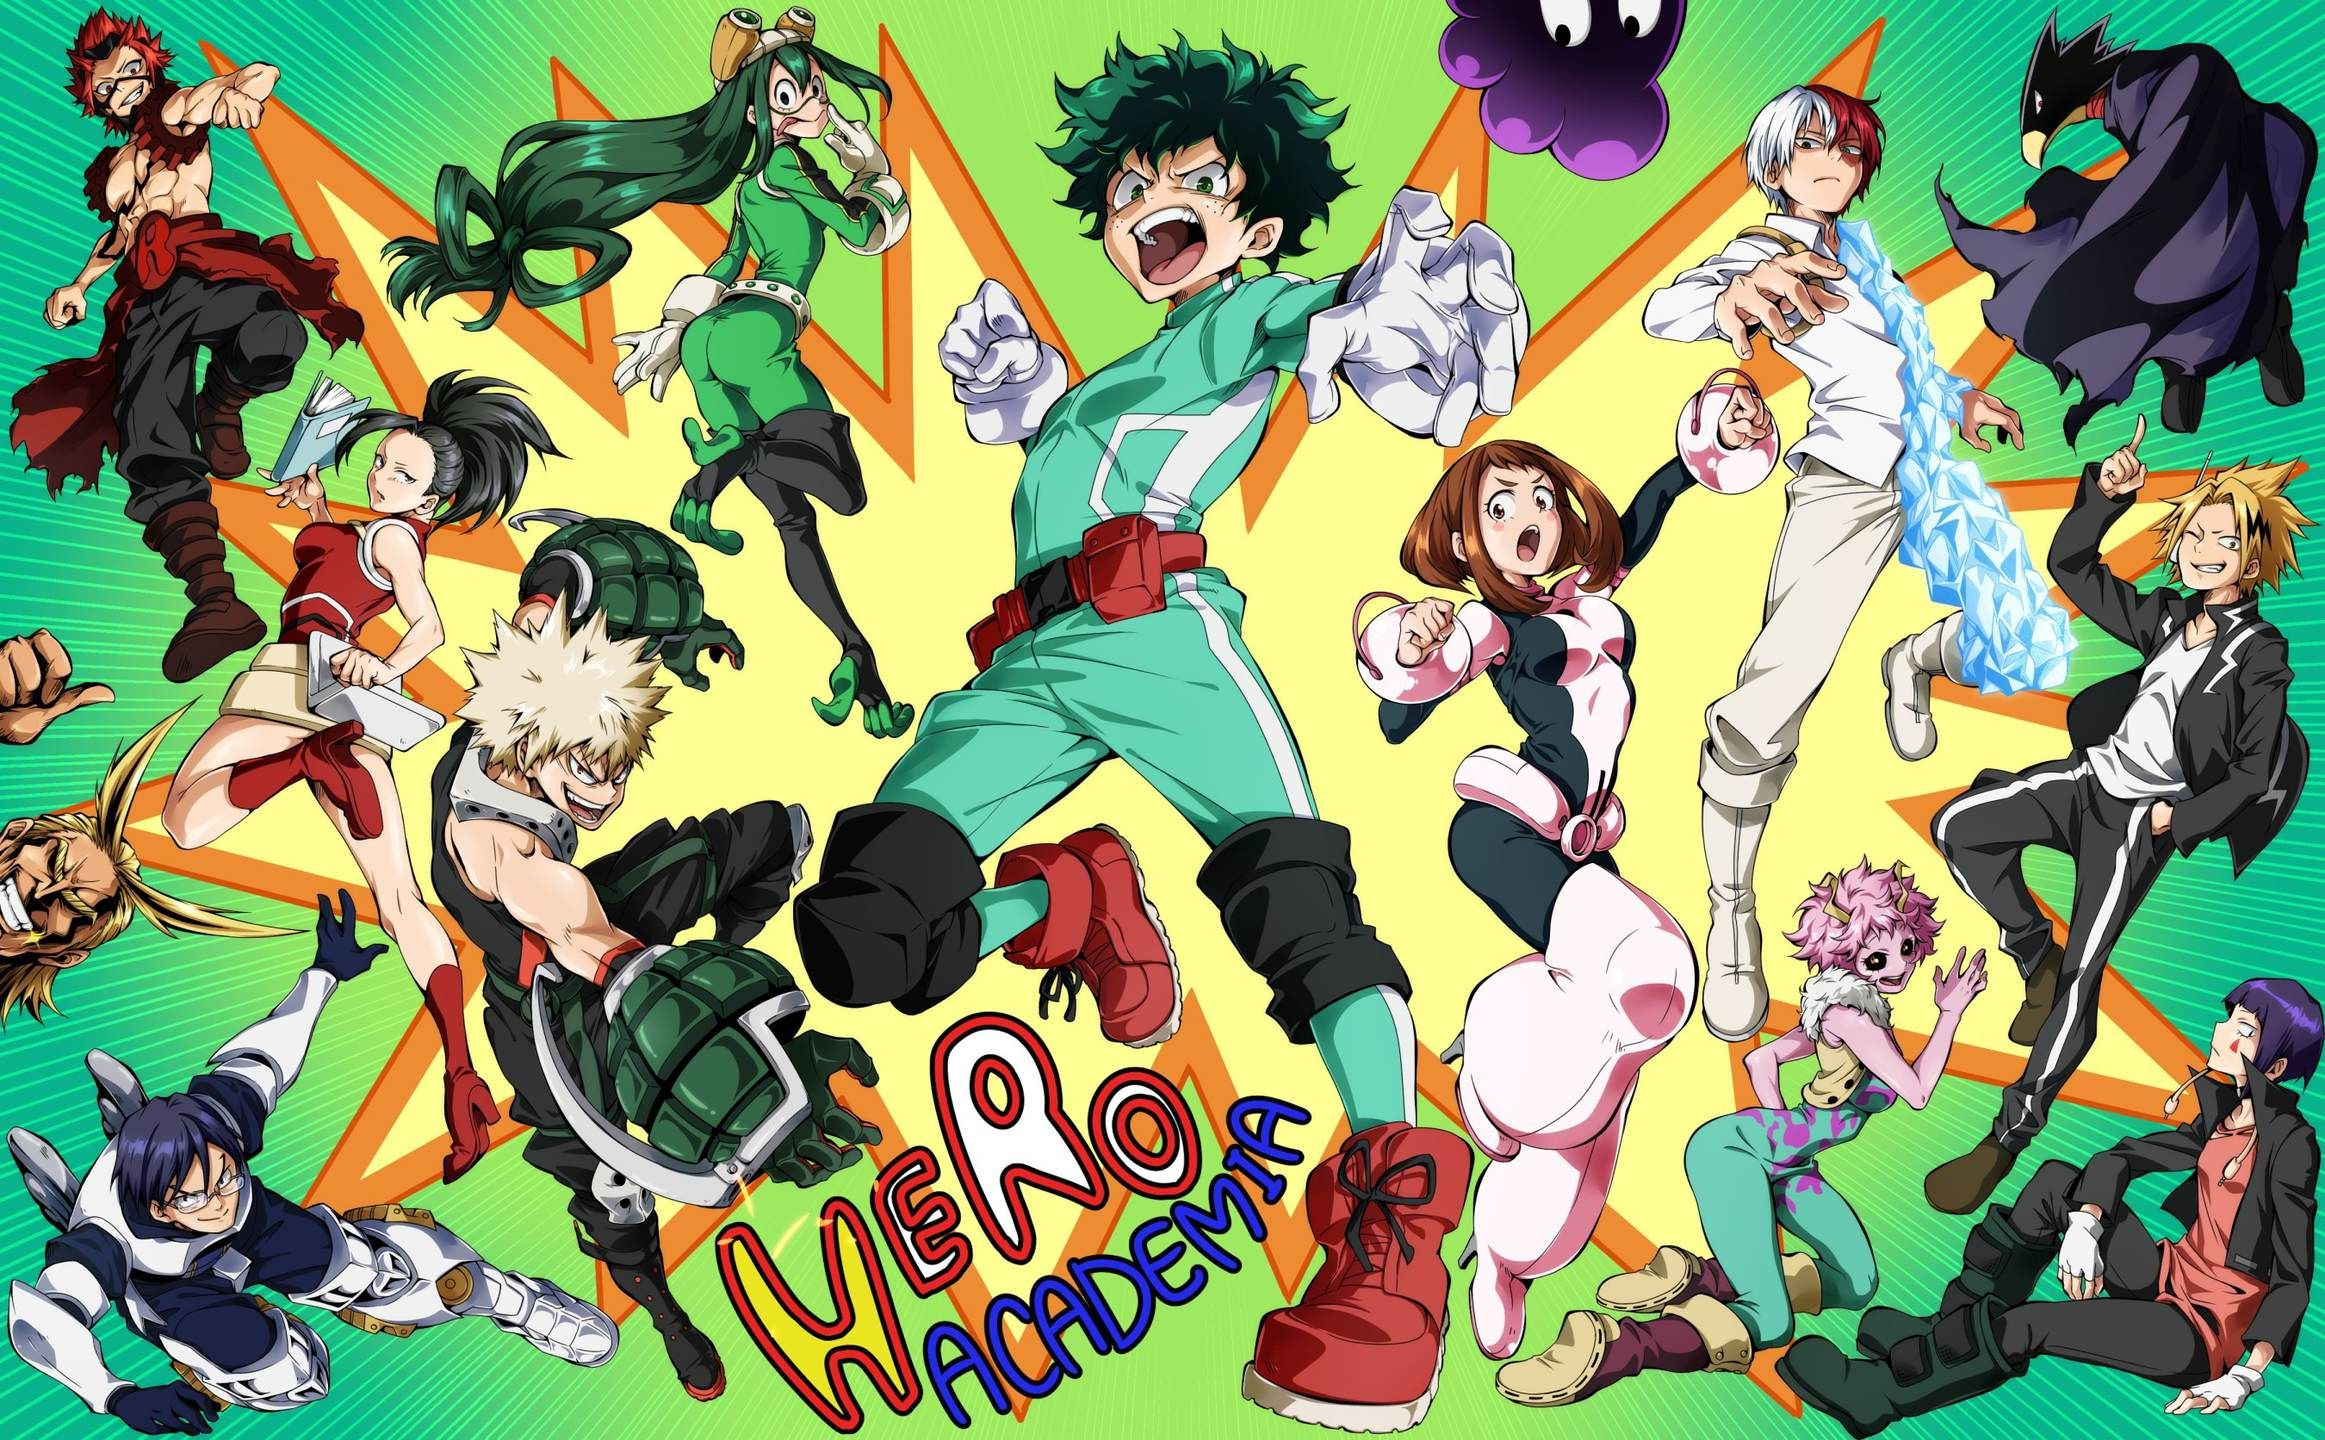 Boku No Hero Academia Hd Wallpapers New Tab Install Boku No Hero Academia New Tab And Get Hd Wallpapers Of Deku Made For Fans Wh Hero Wallpaper Hero My Hero